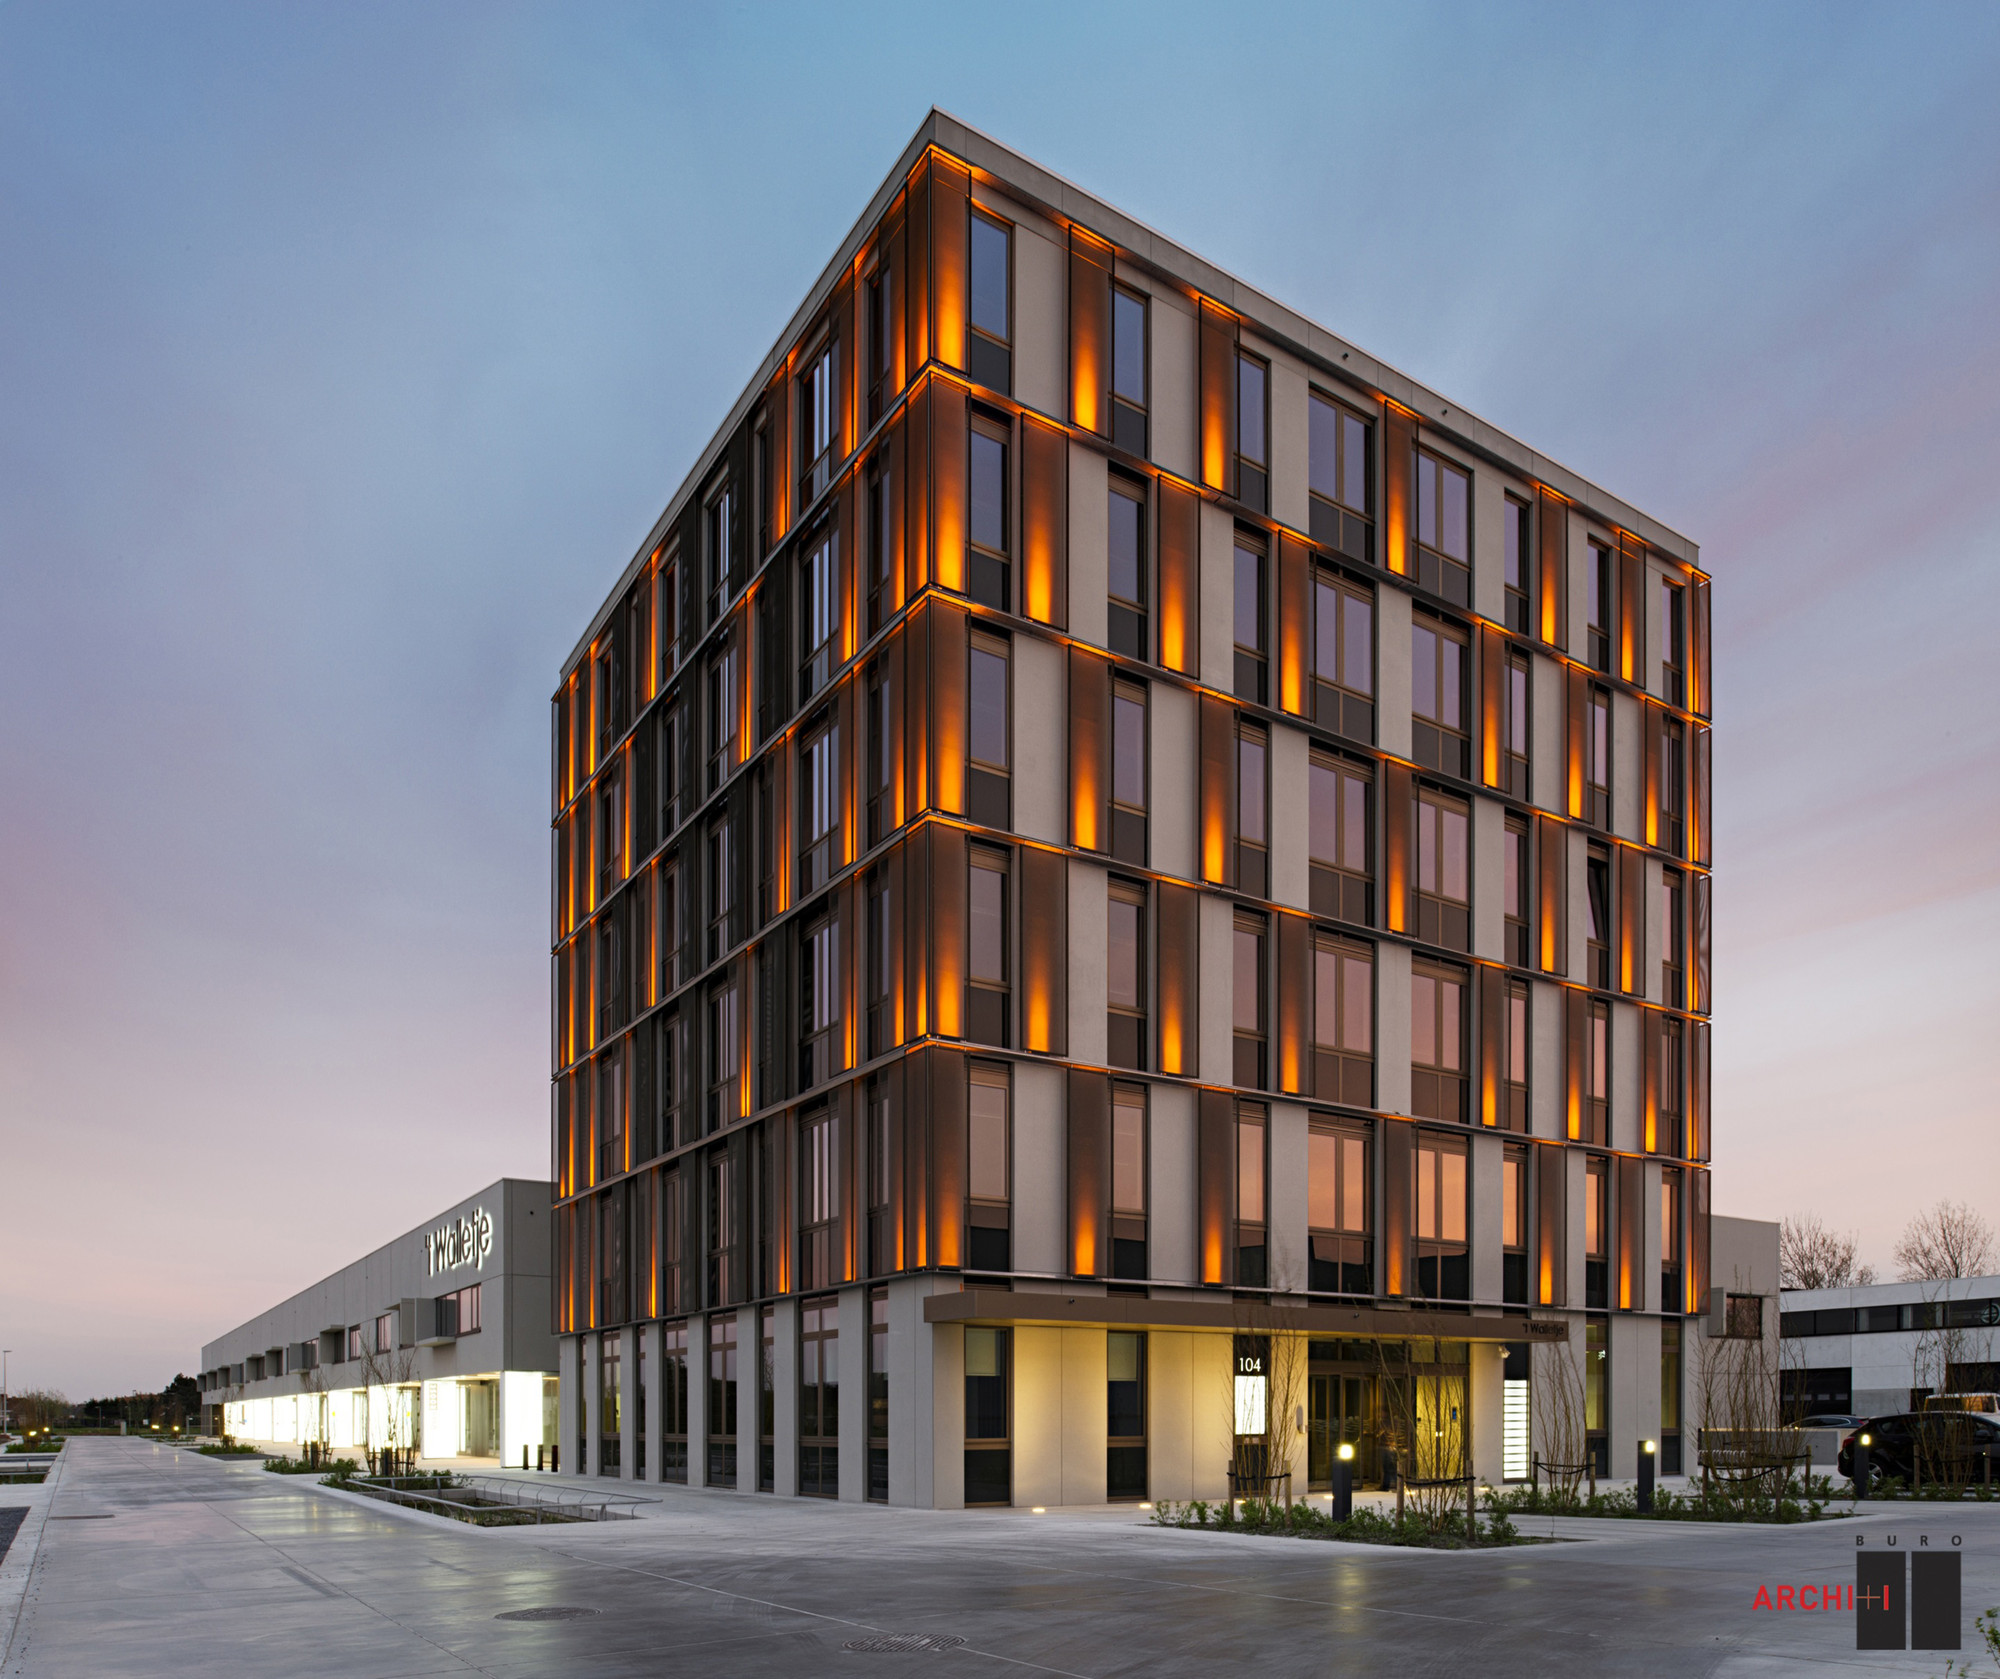 Business Complex Building 'T Walletje Knokke-Heist / BURO II & ARCHI+I, © Klaas Verdru